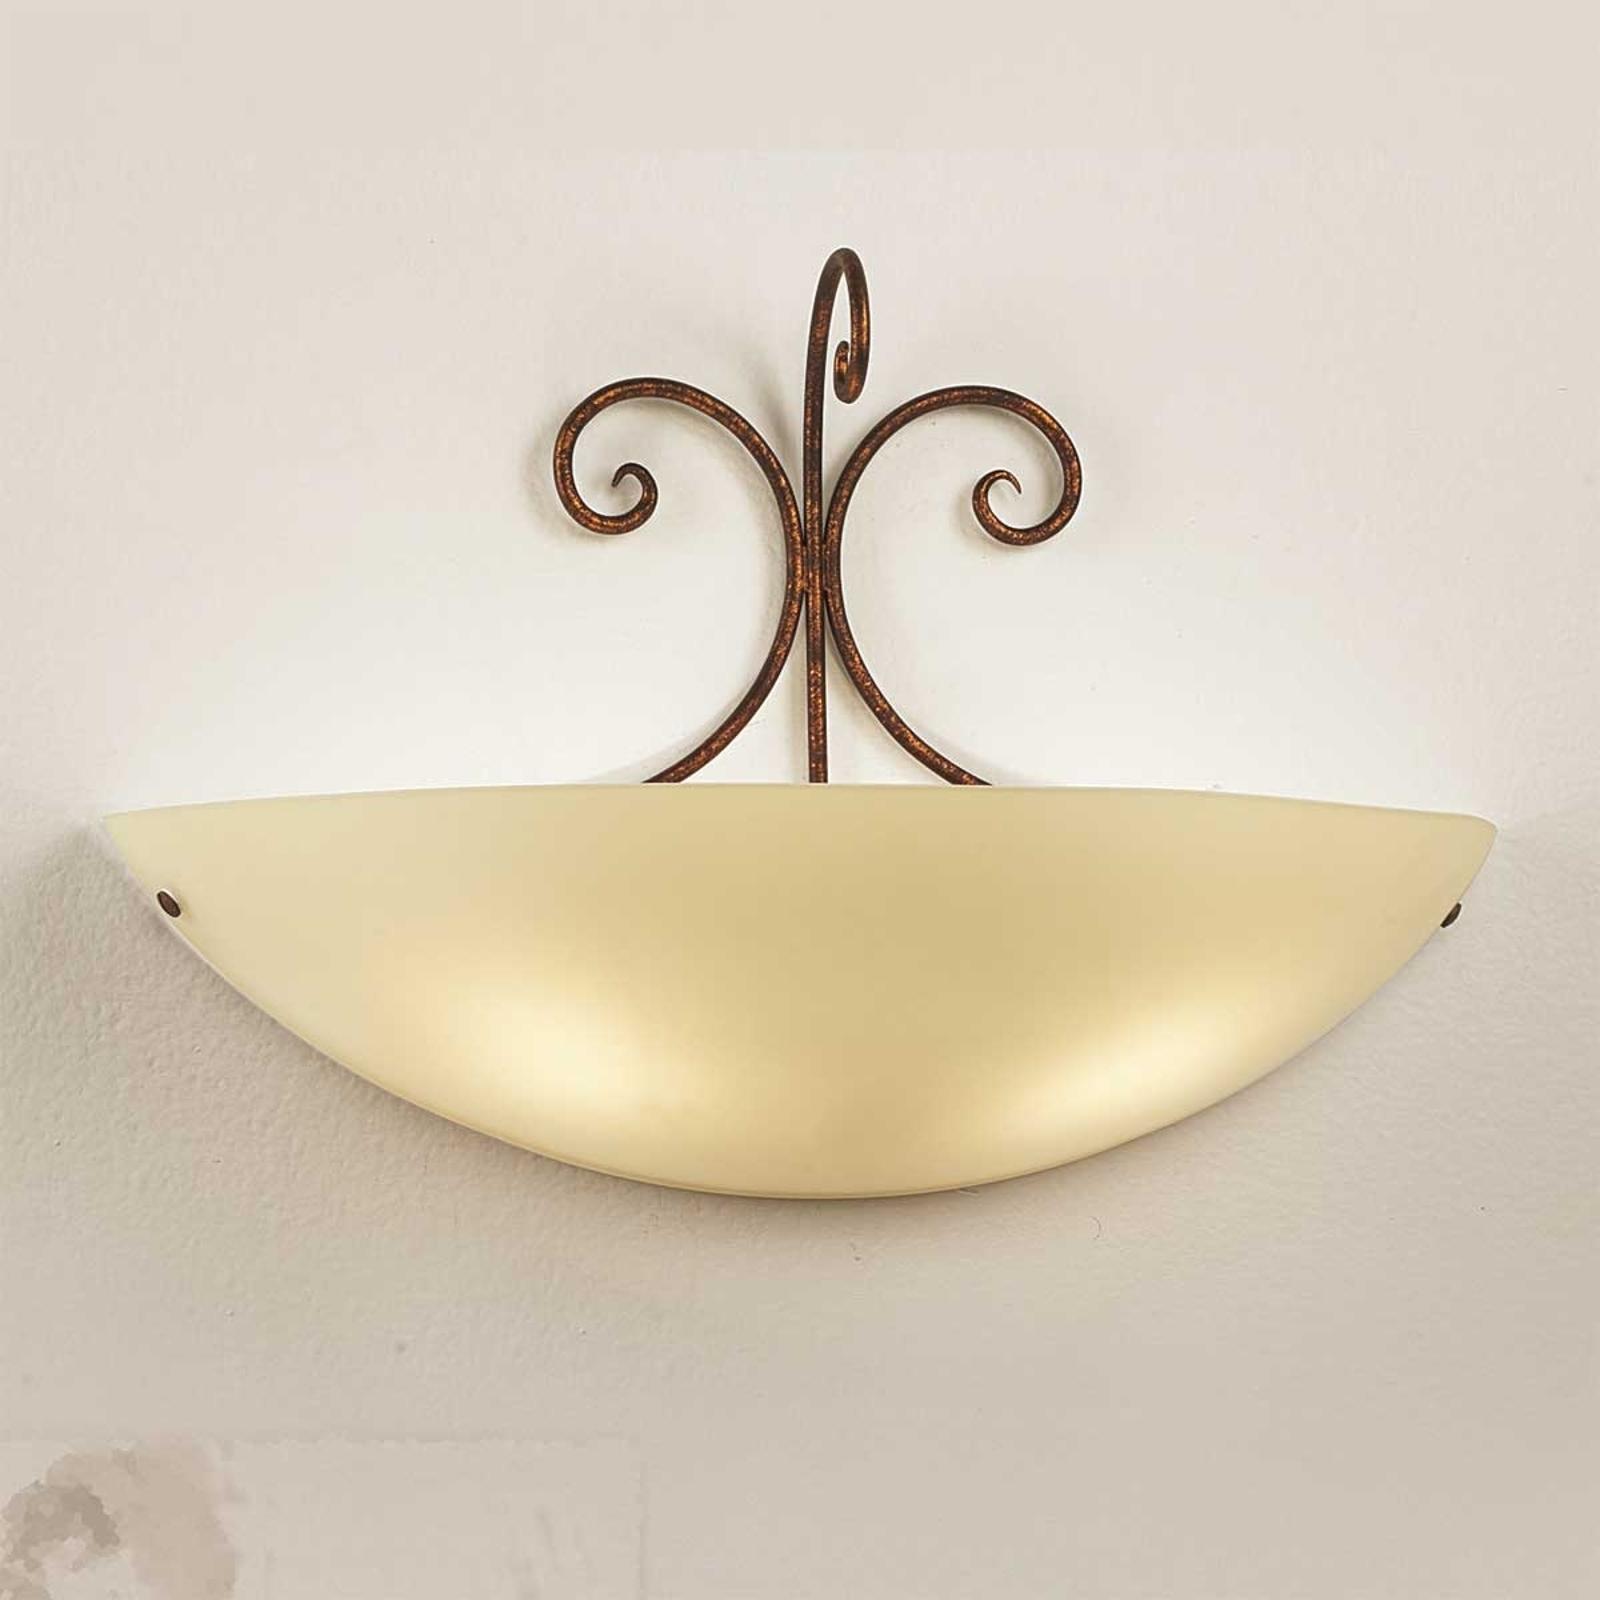 Federico wandlamp van antiek bruin metaal